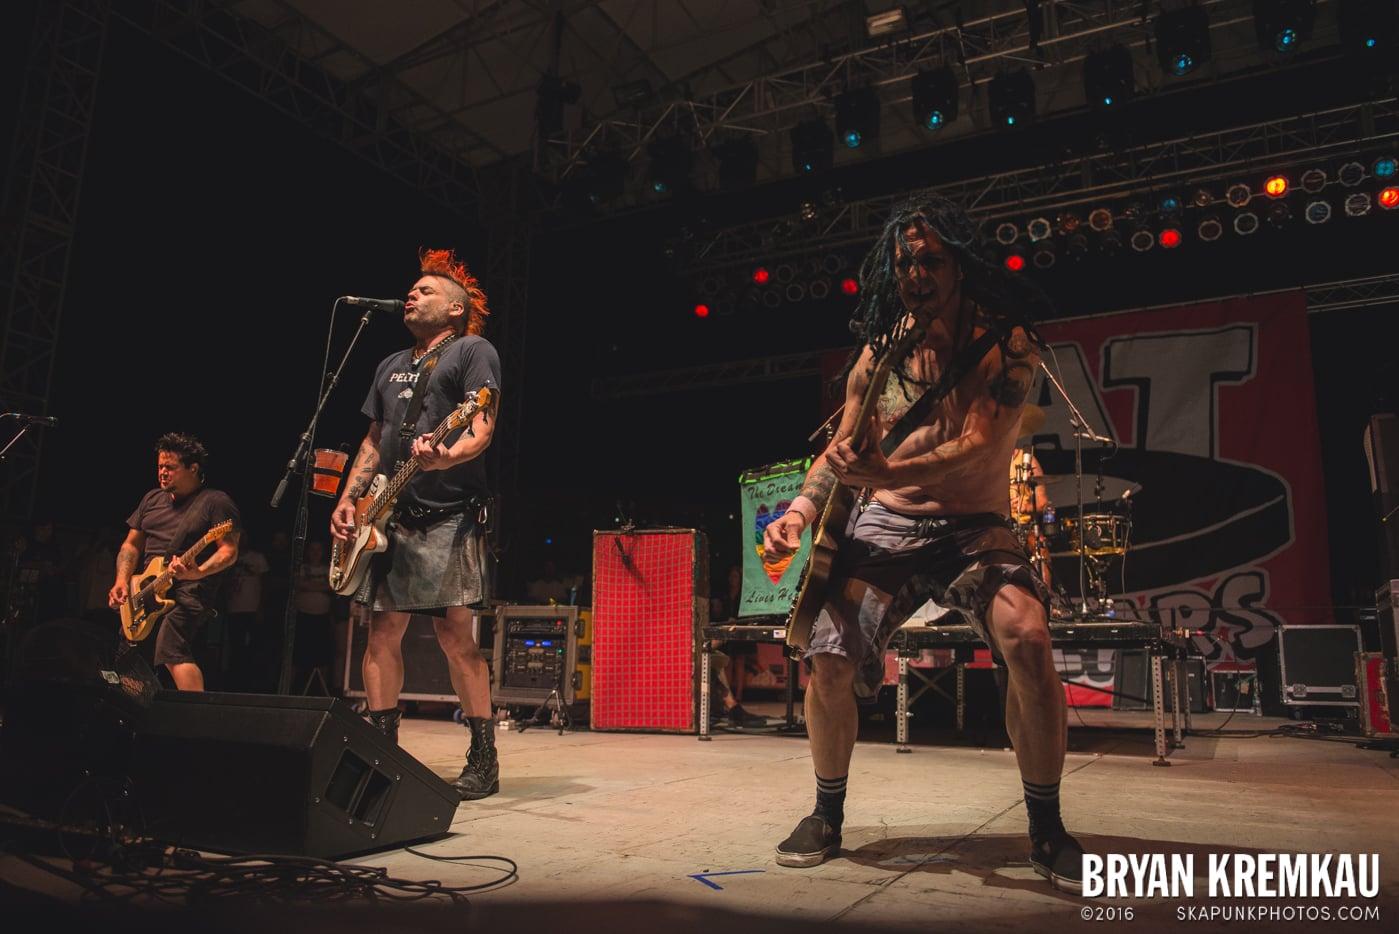 NOFX @ Stone Pony Summer Stage, Asbury Park, NJ - 8.15.15 (13)